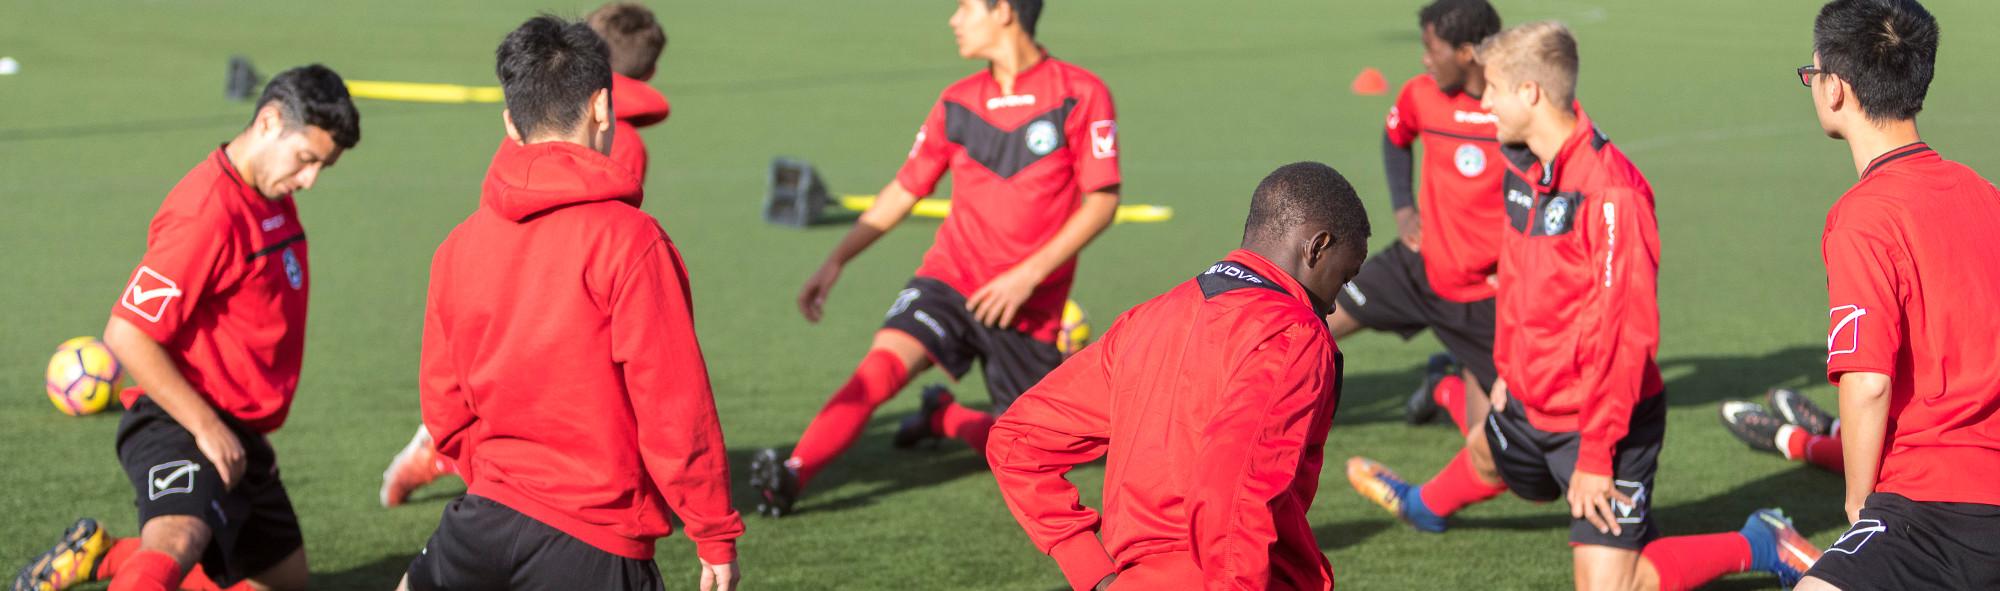 edukick madrid spain football academy overview